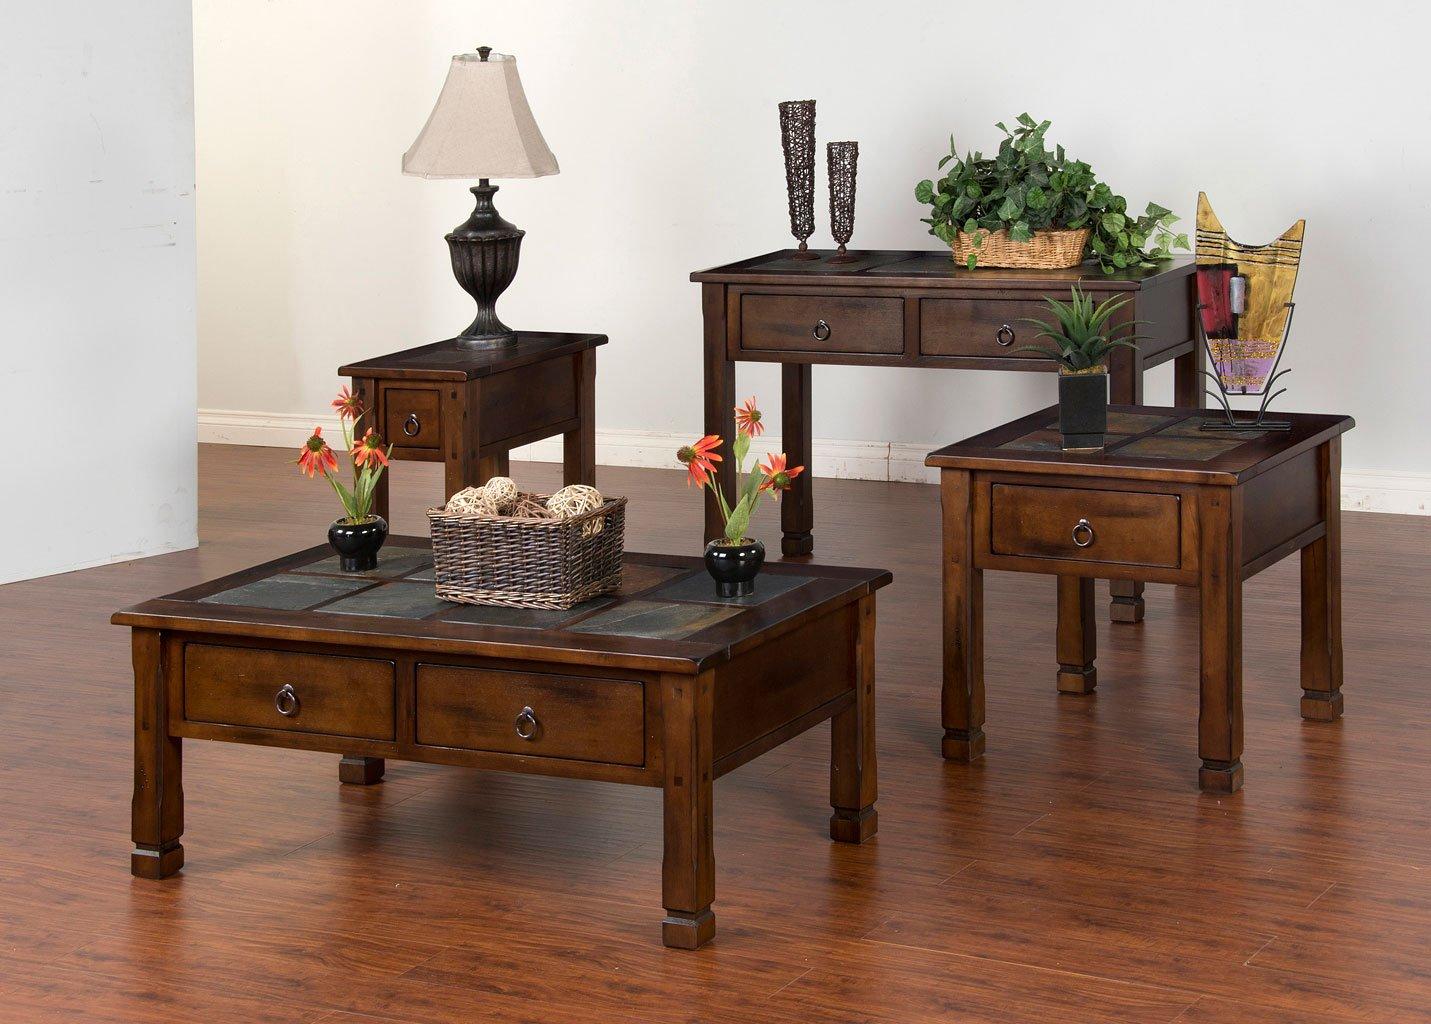 Santa Fe Slate Top Rectangular Occasional Table Set Sunny